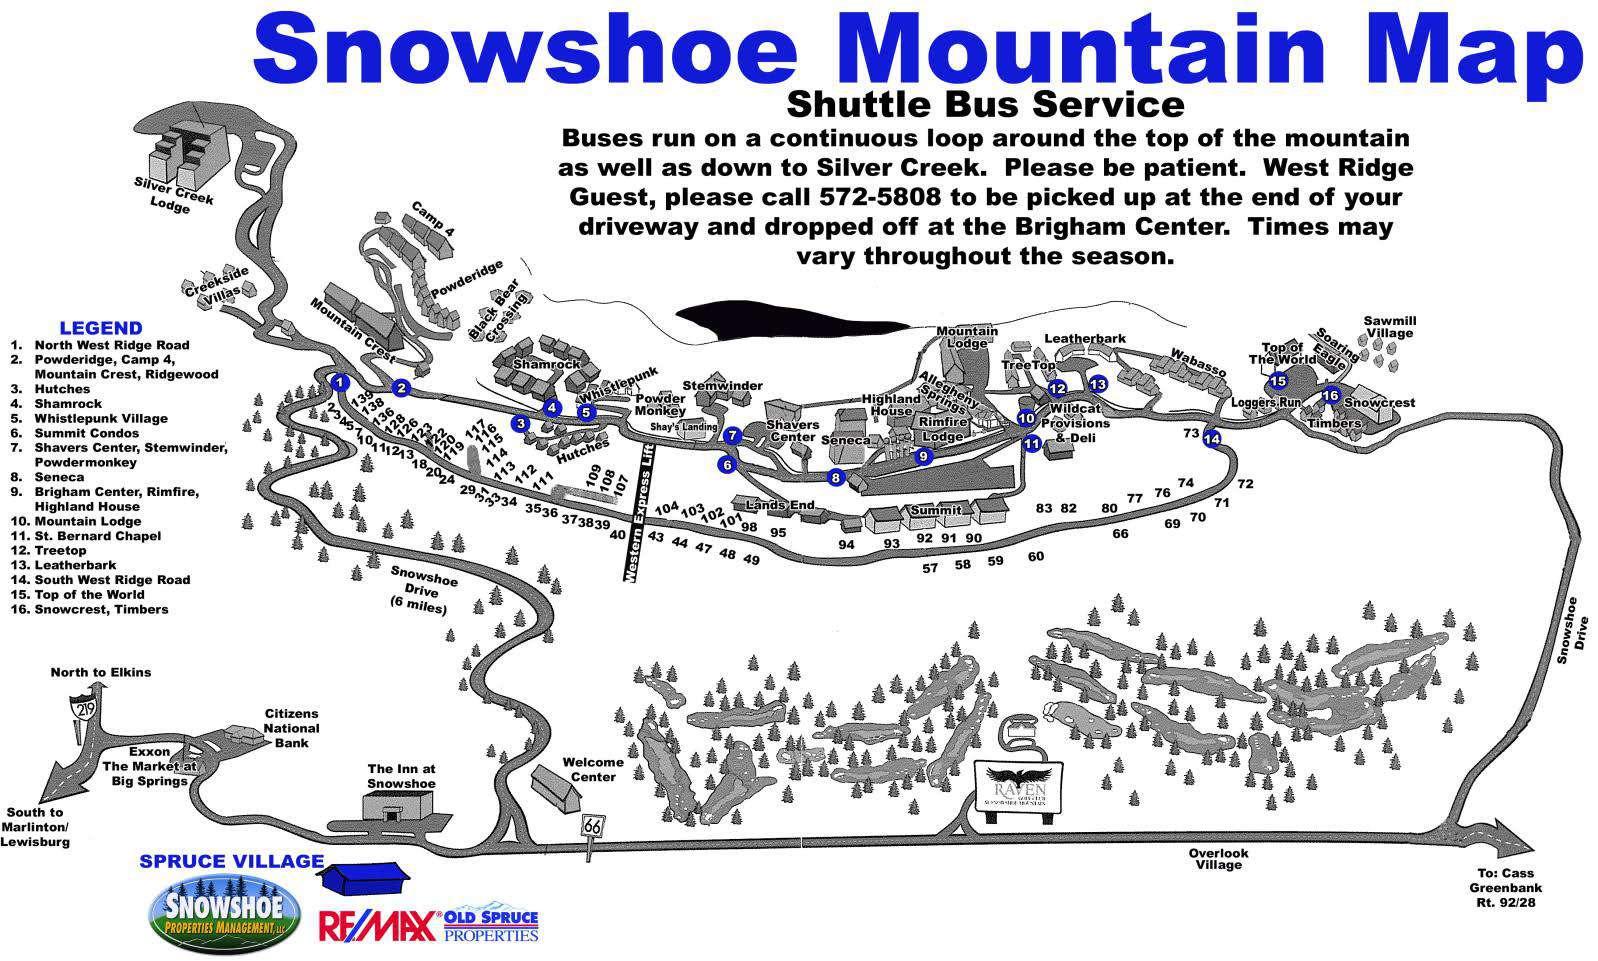 Snowshoe Mountain Map